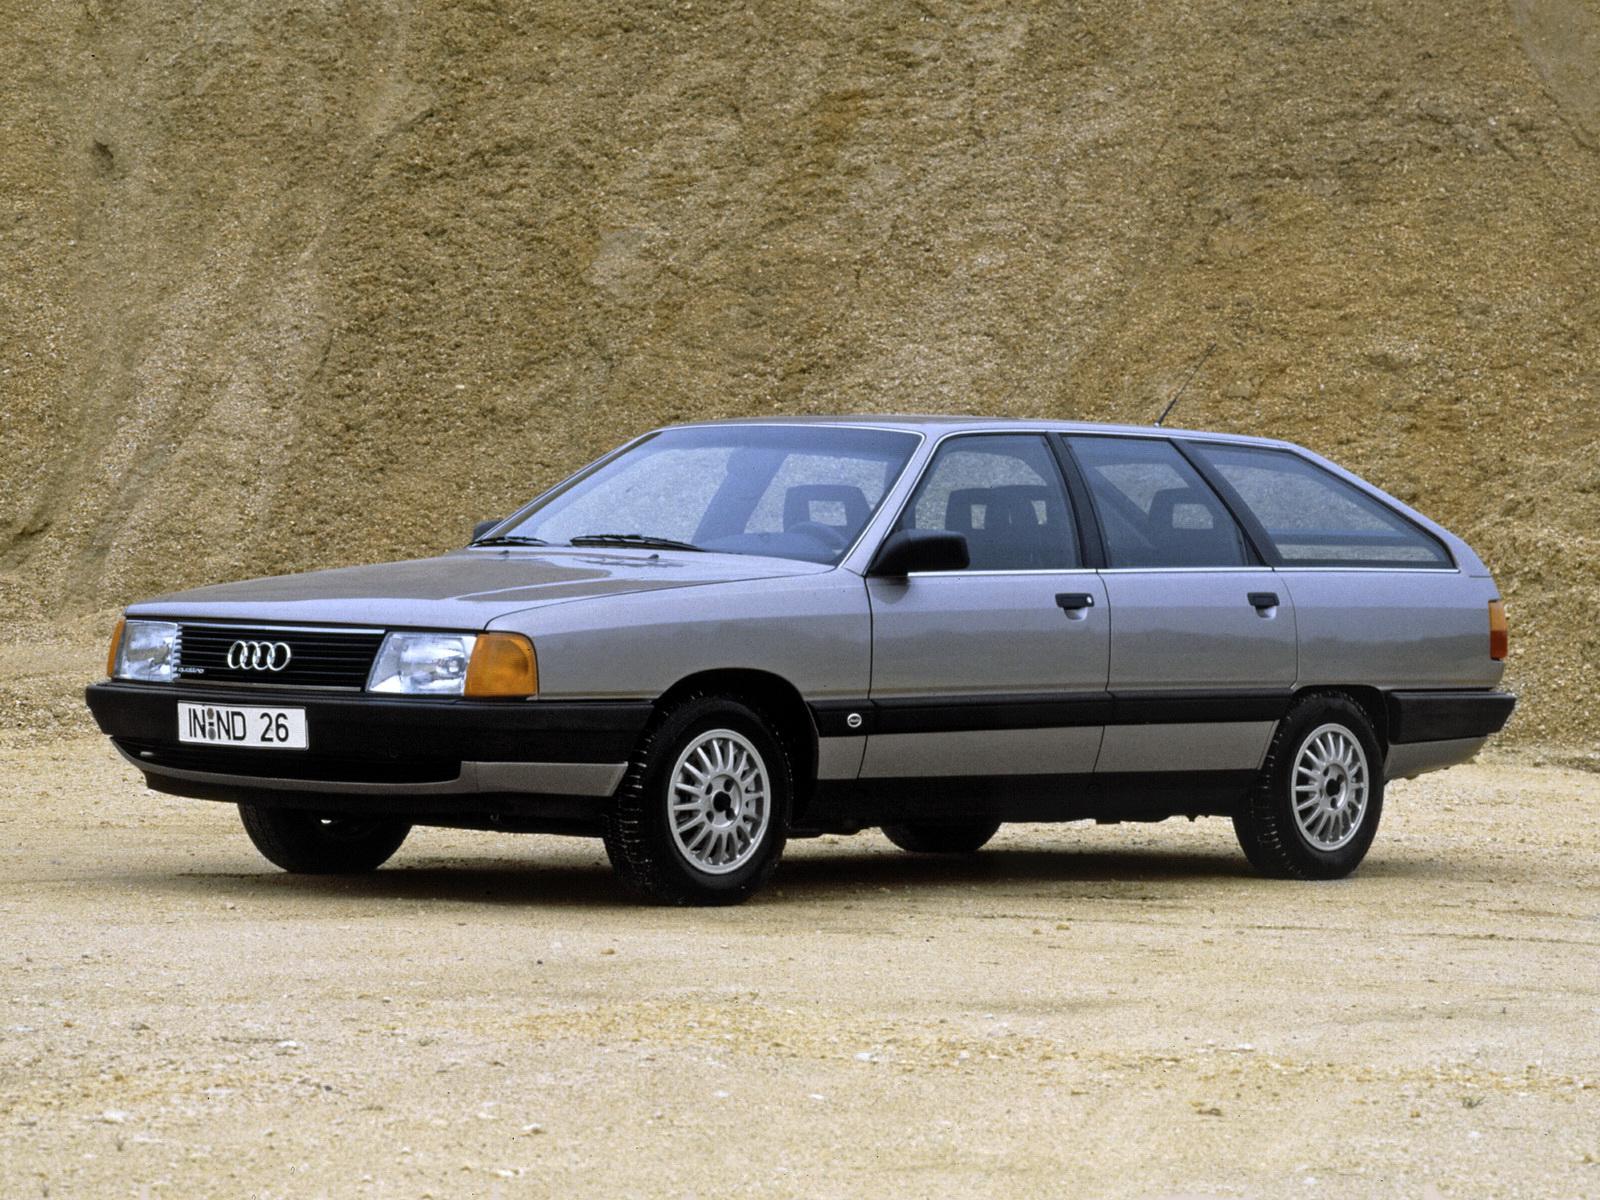 Объём топливного бака Ауди А6. Сколько литров бак на Audi A6?